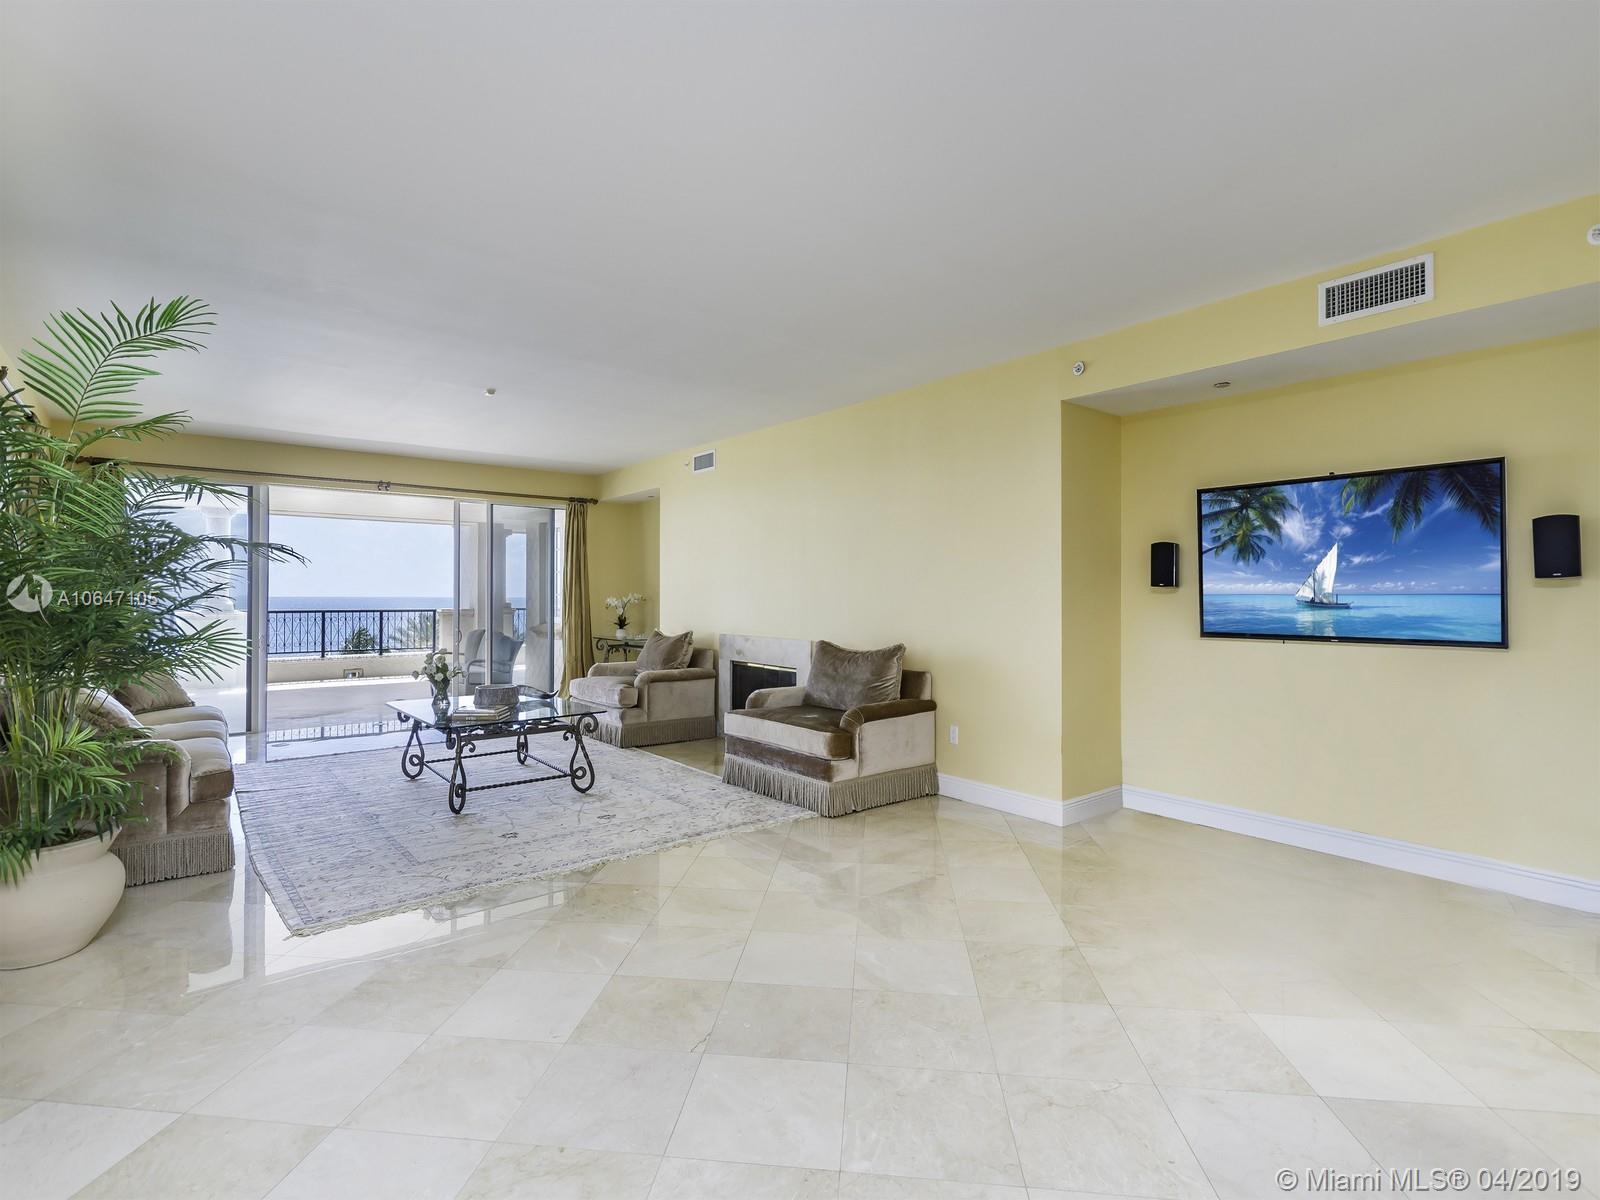 Аренда квартиры по адресу 7600 Fisher Island Dr, Fisher Island, FL 33109 в США